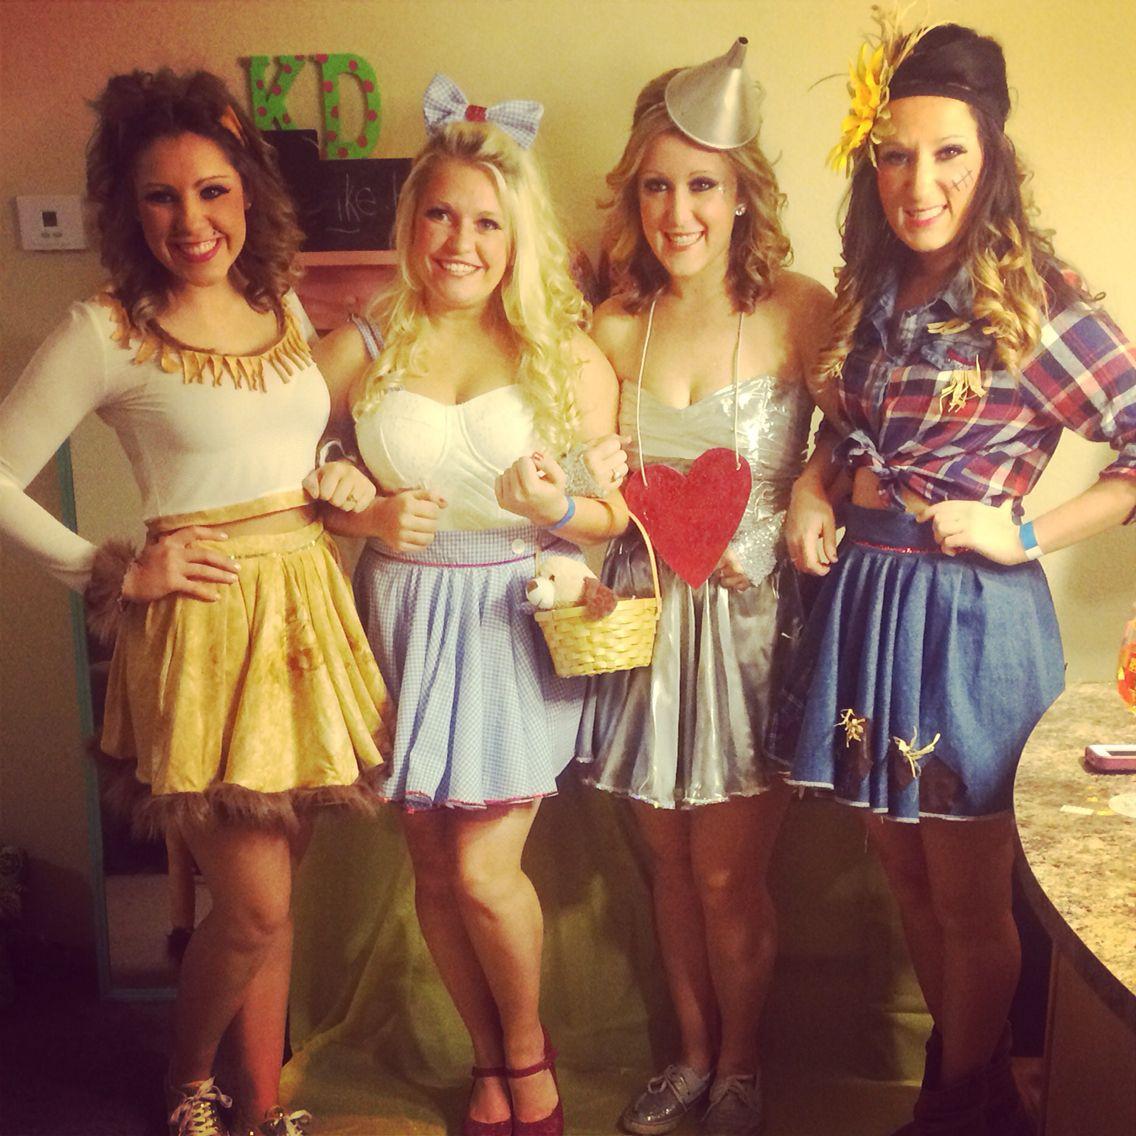 Redneck couple costume - Shlomit Ofir | Let's Dress Up! Costume ...